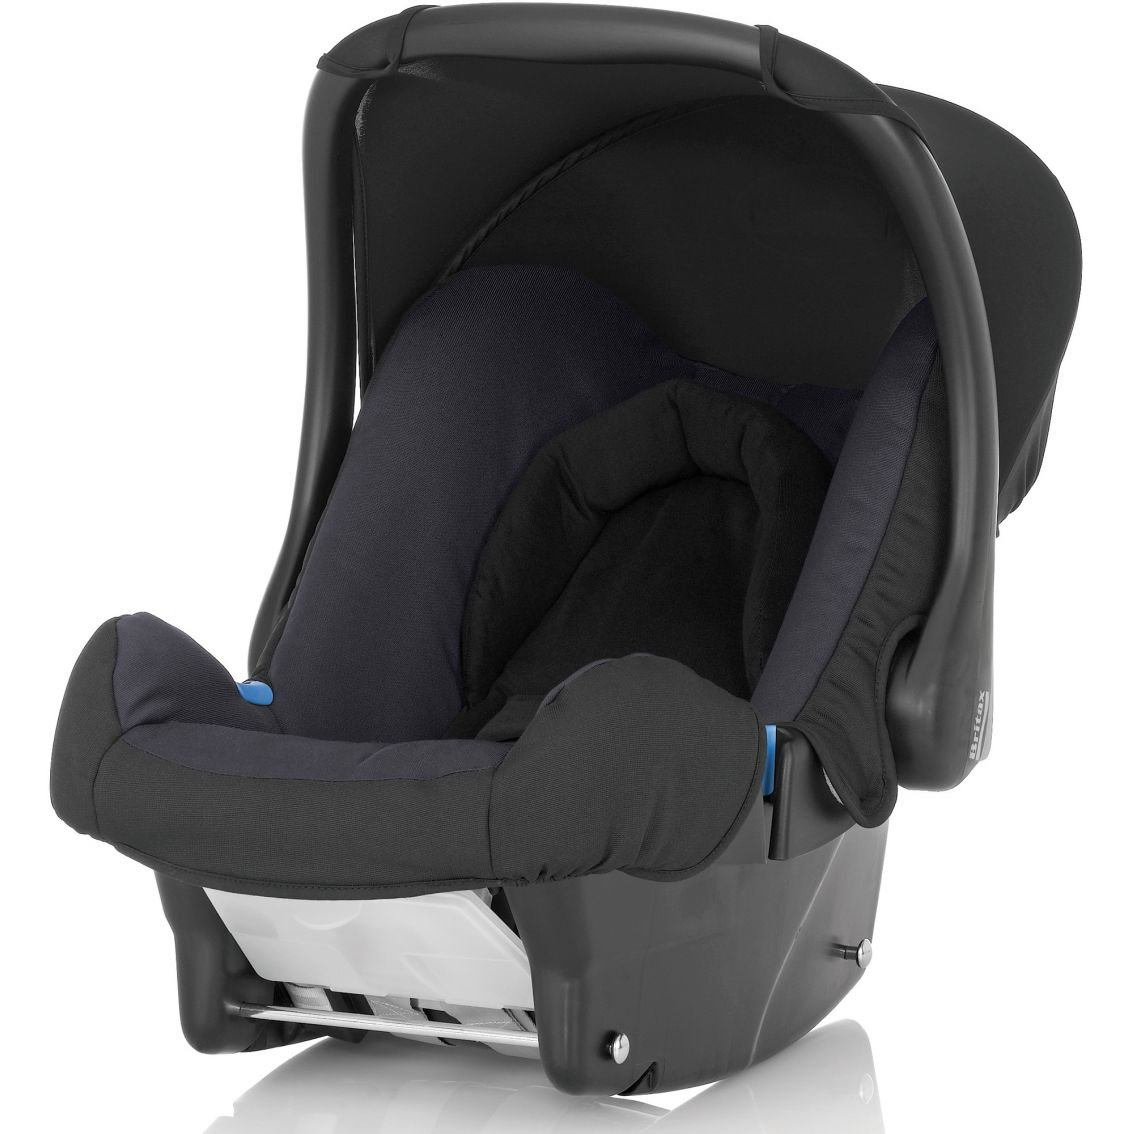 Britax Baby Carrier Car Seat